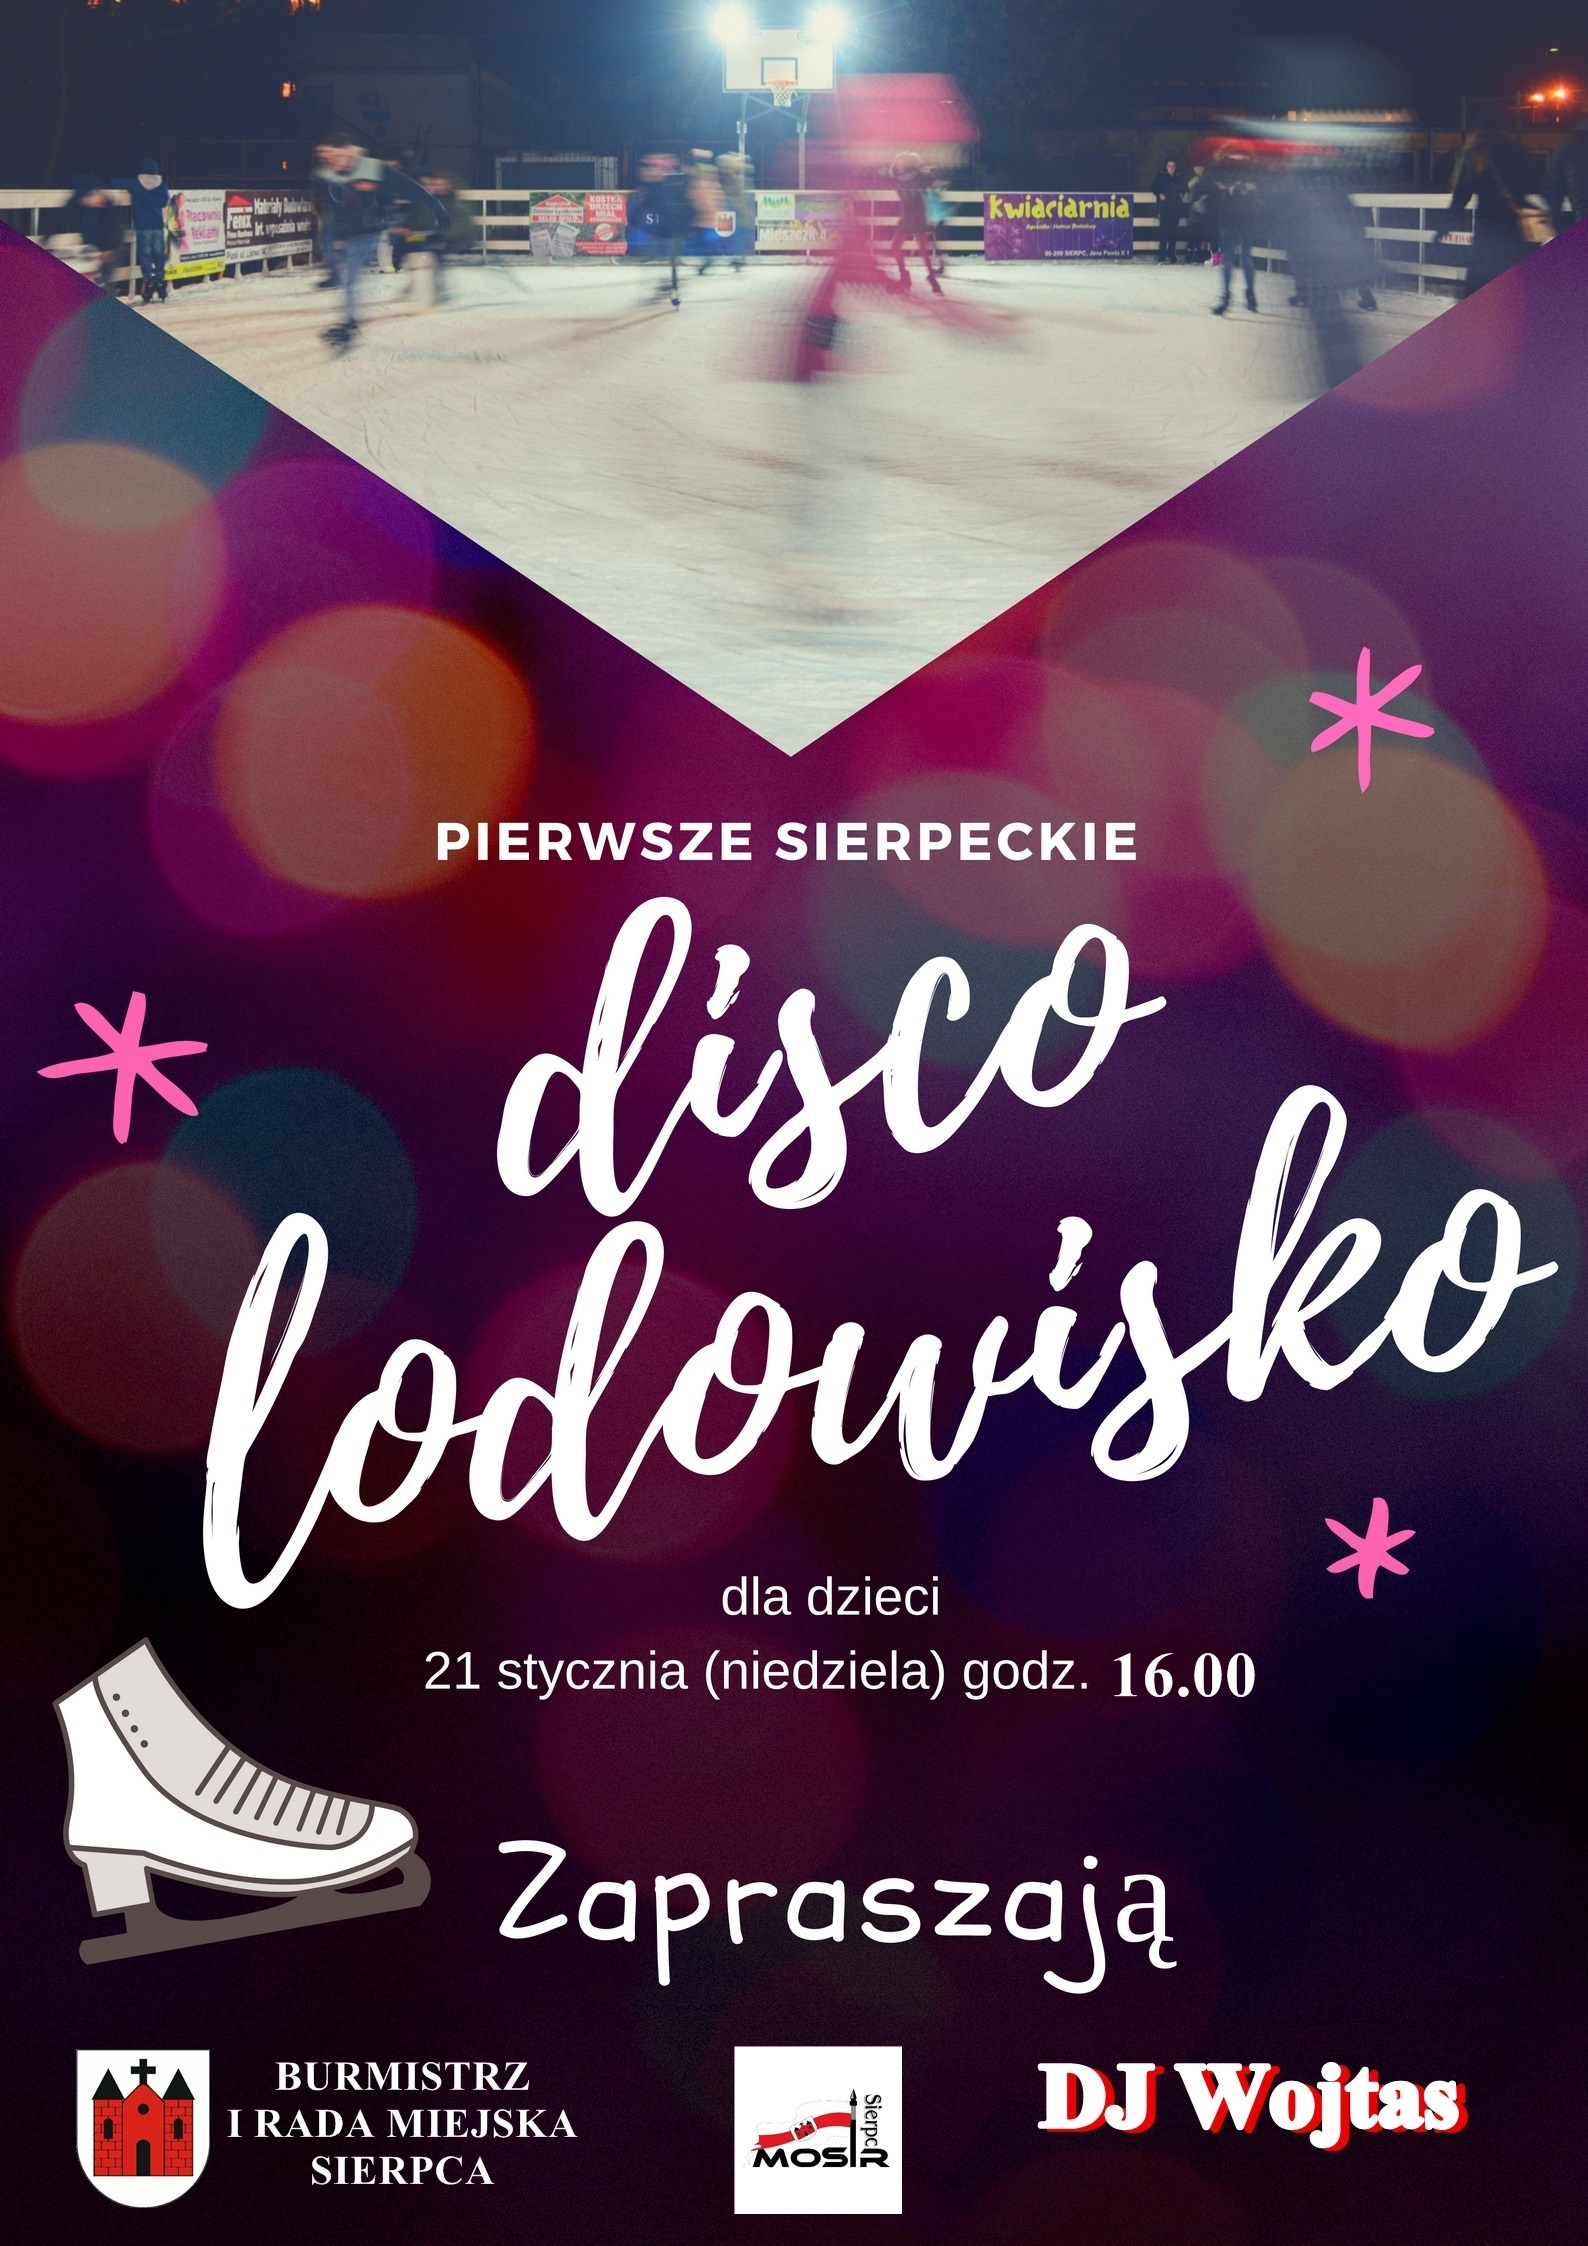 discolodowisko